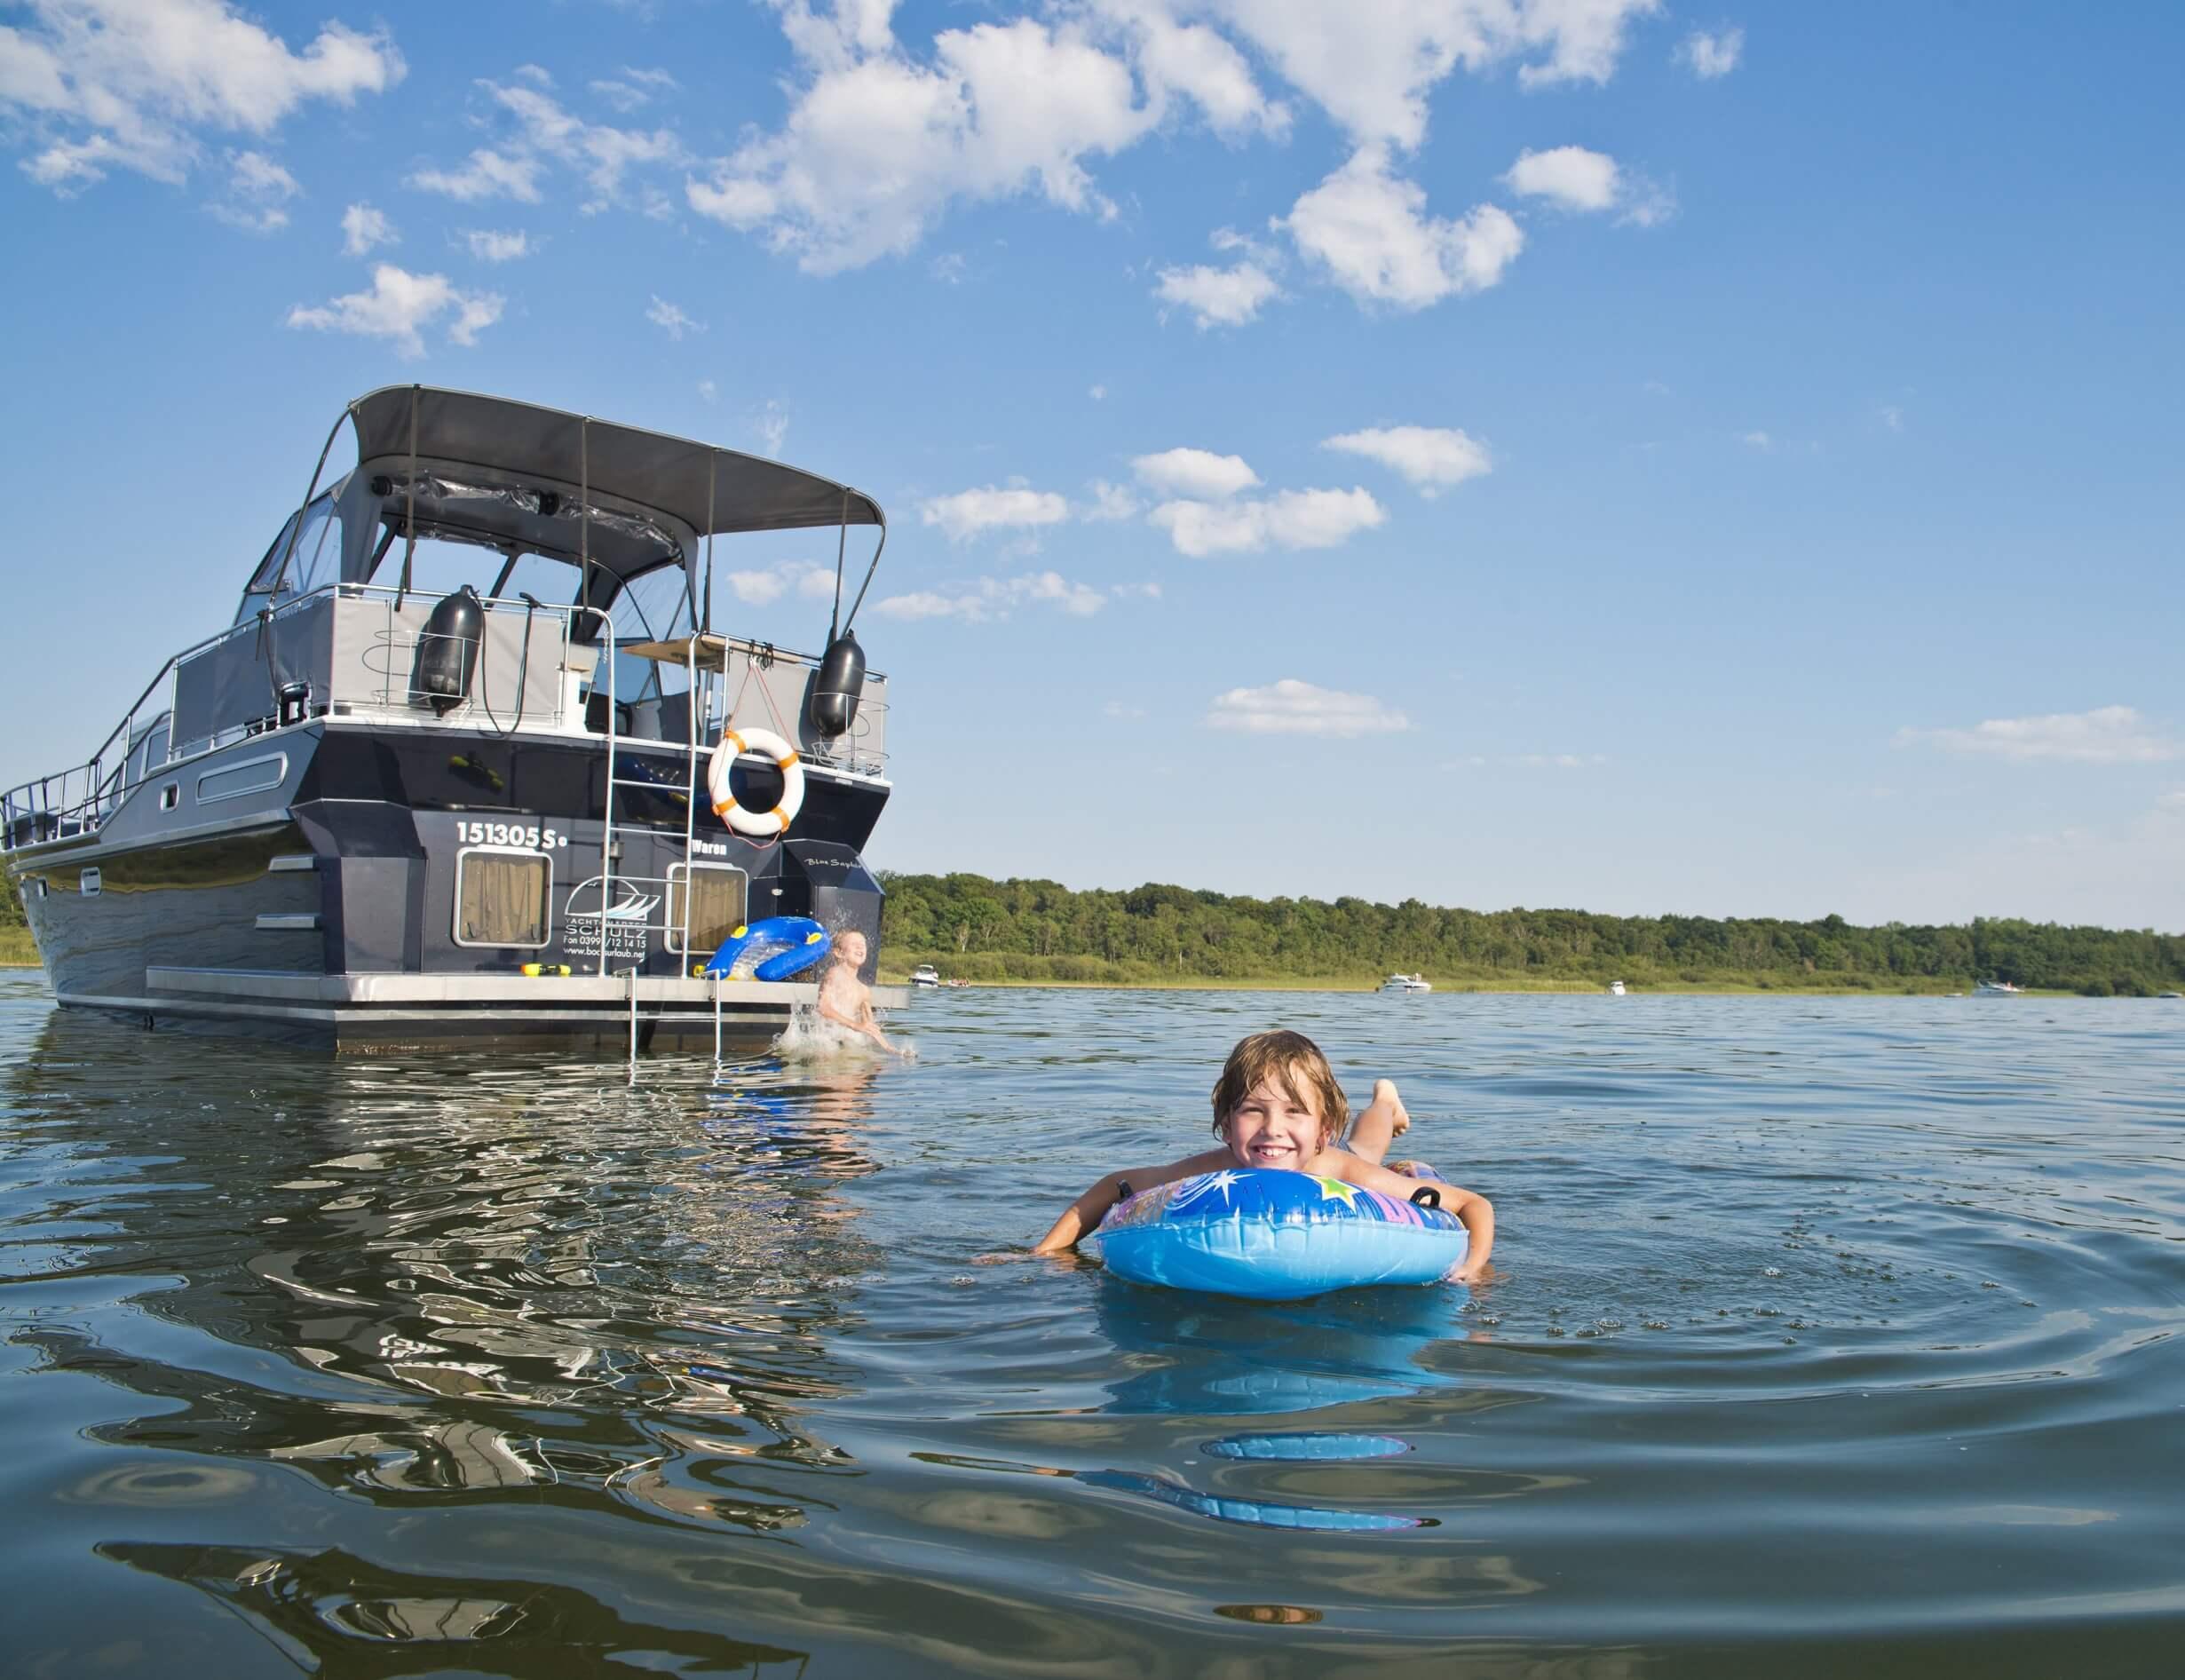 Mini-Abenteuer - Miete dir ein Hausboot